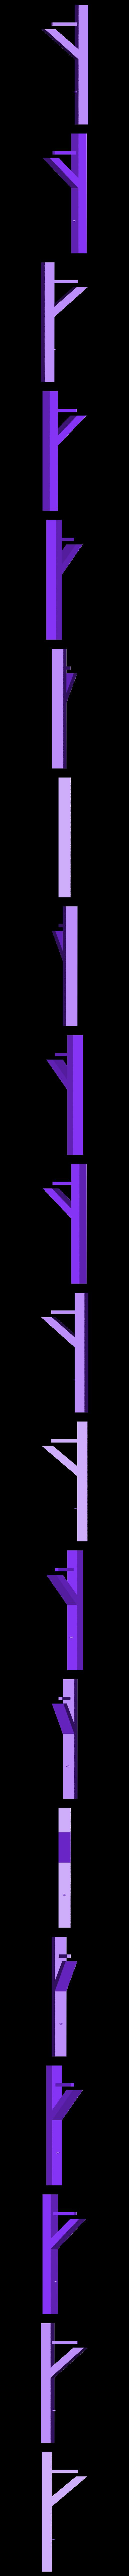 gallows2.stl Download free STL file Hangman Game • 3D printable design, M3Dr